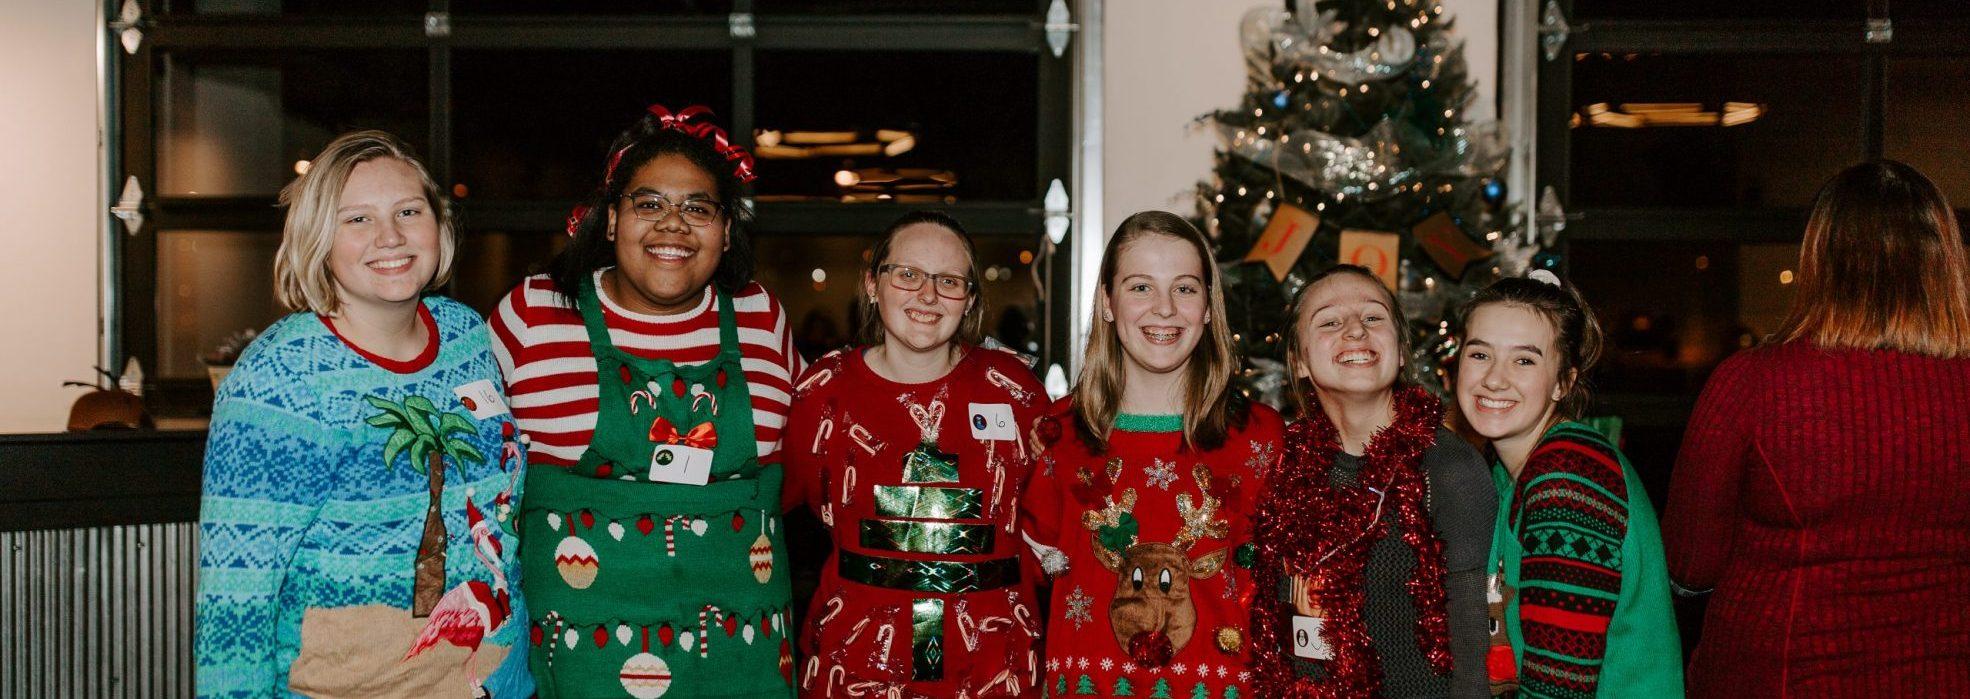 ladies night christmas at candlewood church